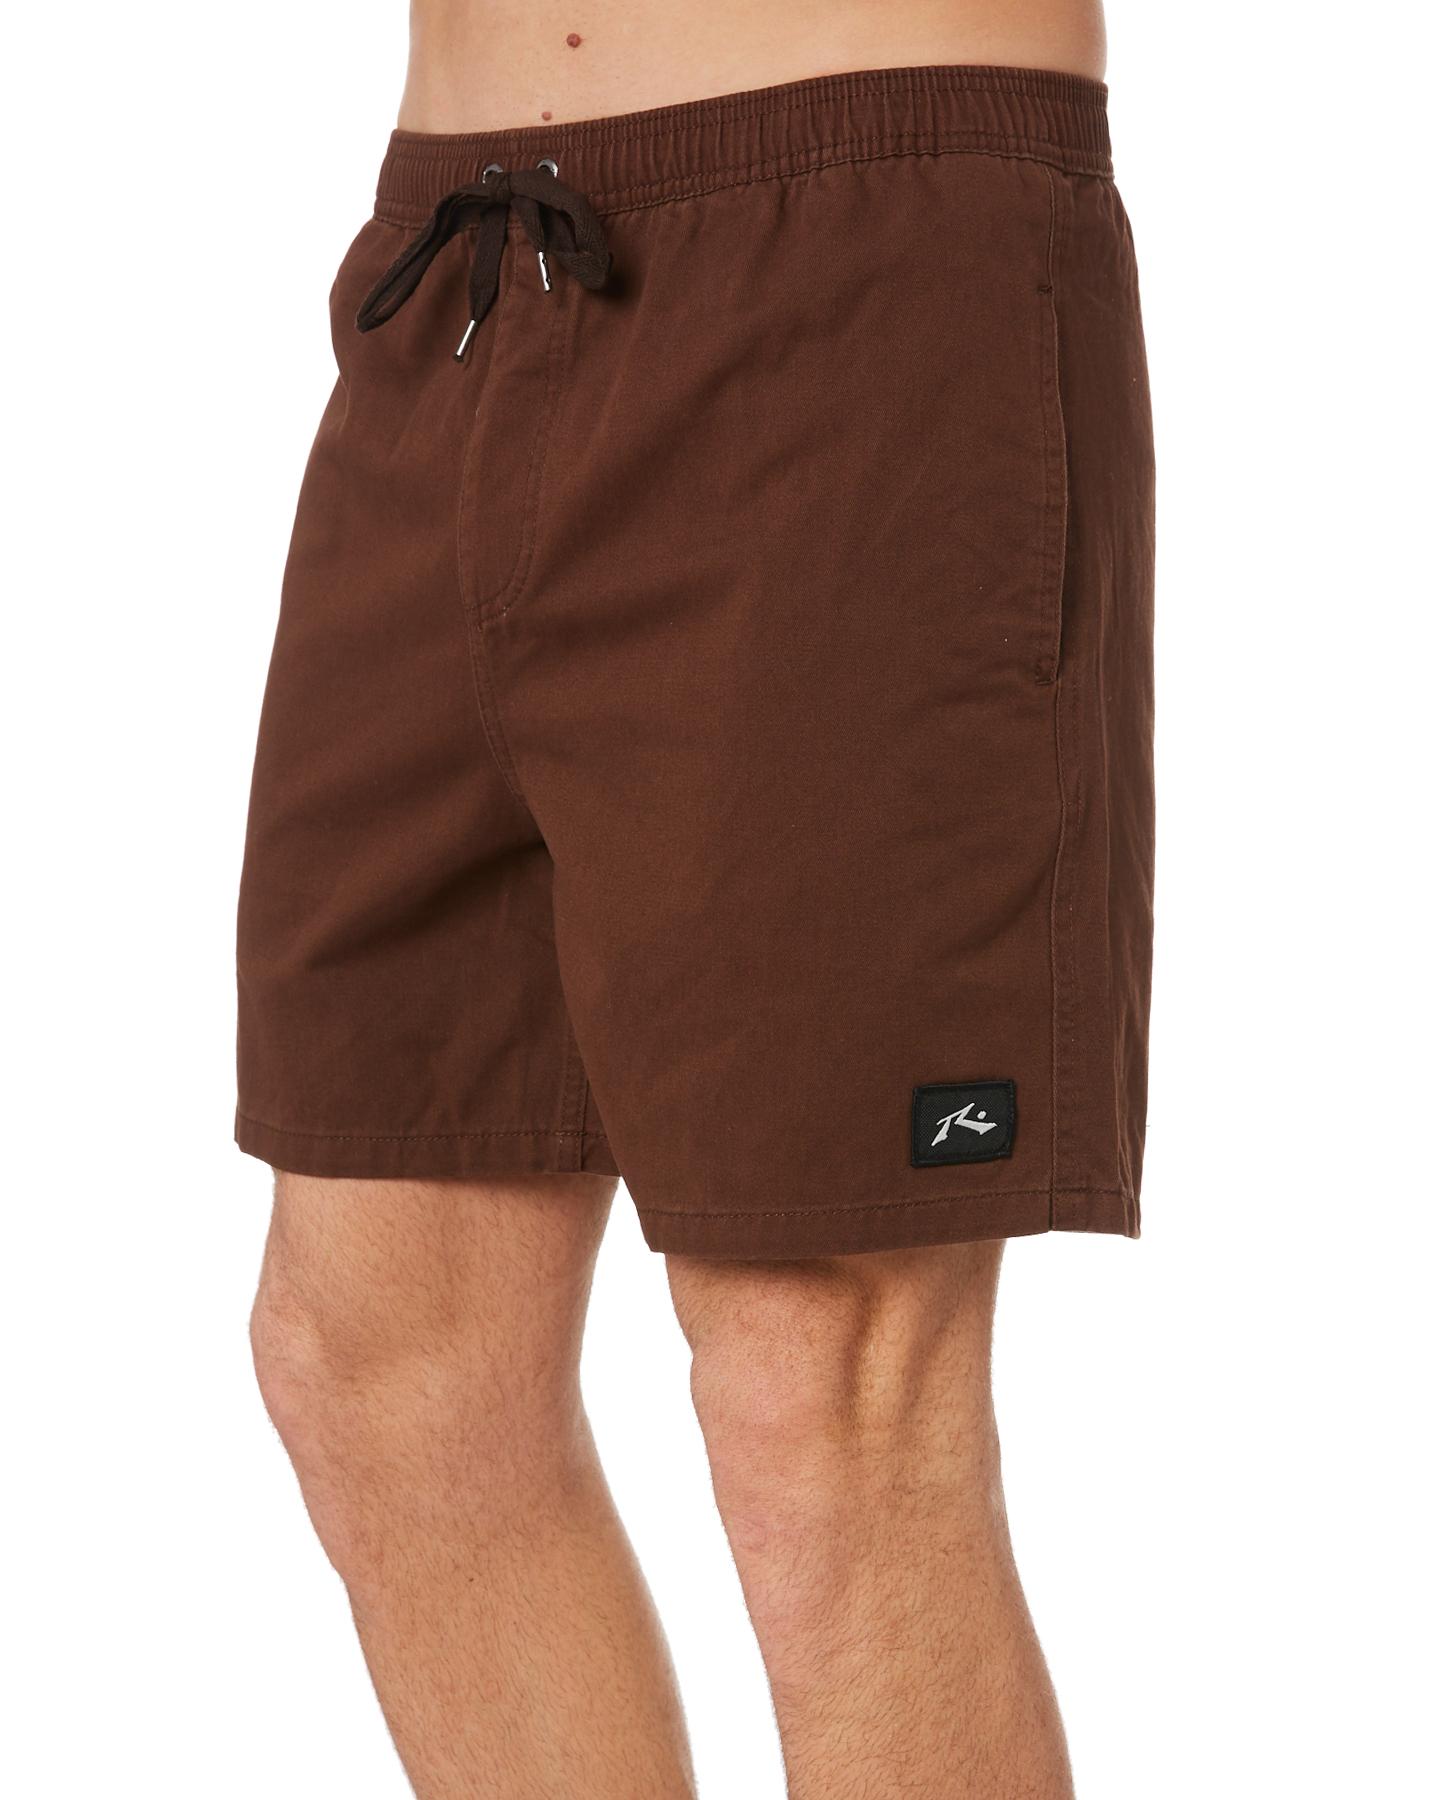 New-Rusty-Men-039-s-Hook-Elastic-Short-Cotton-Blue thumbnail 7